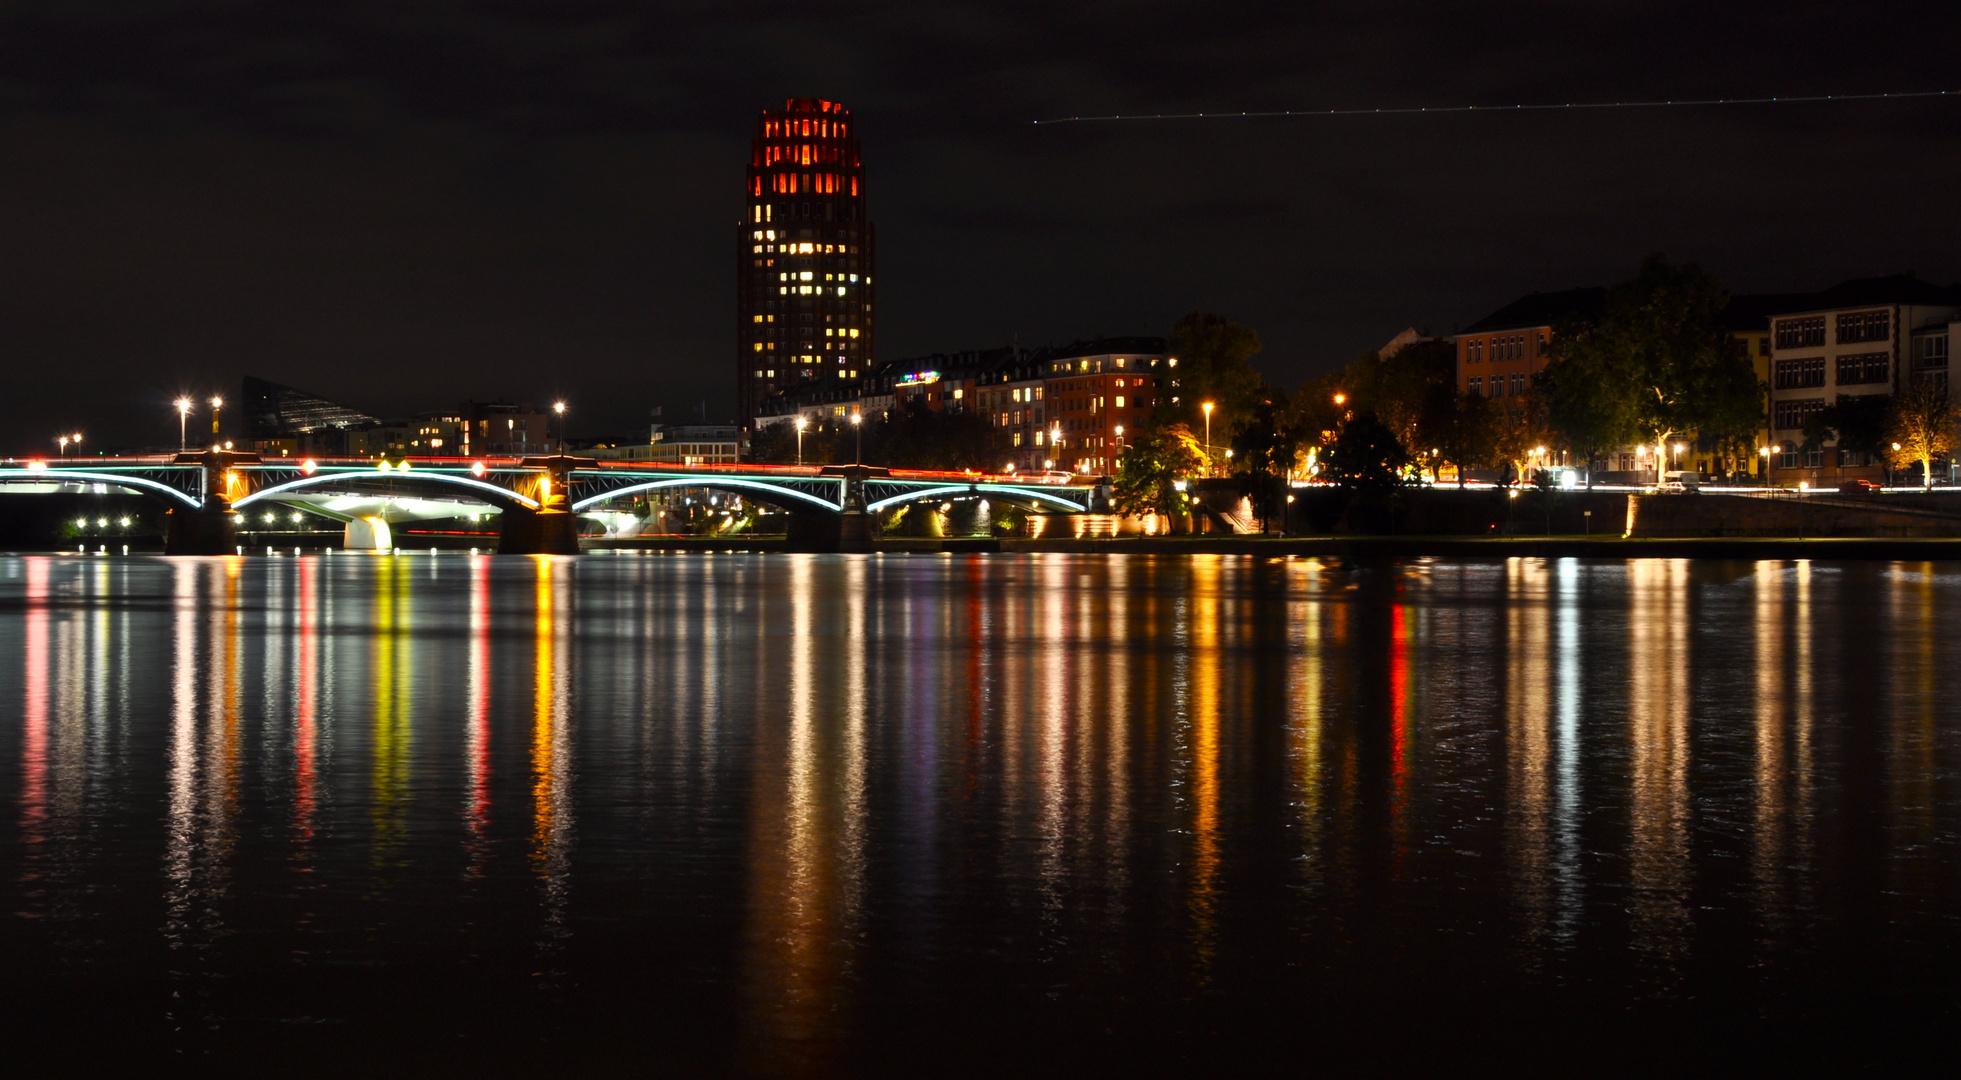 Gute Nacht Grüße aus Frankfurt